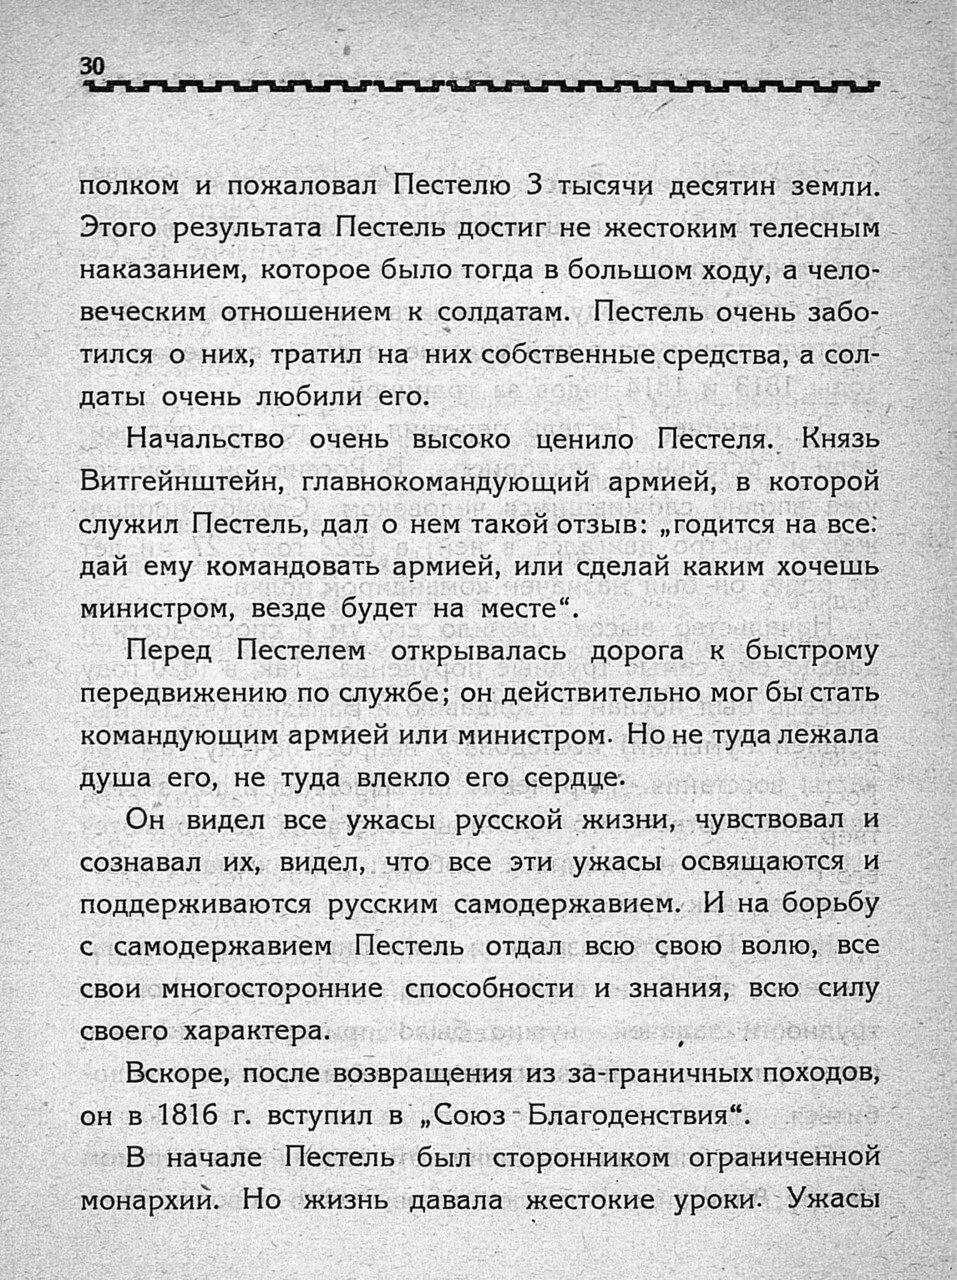 https://img-fotki.yandex.ru/get/112407/199368979.23/0_1bfae2_b531c007_XXXL.jpg